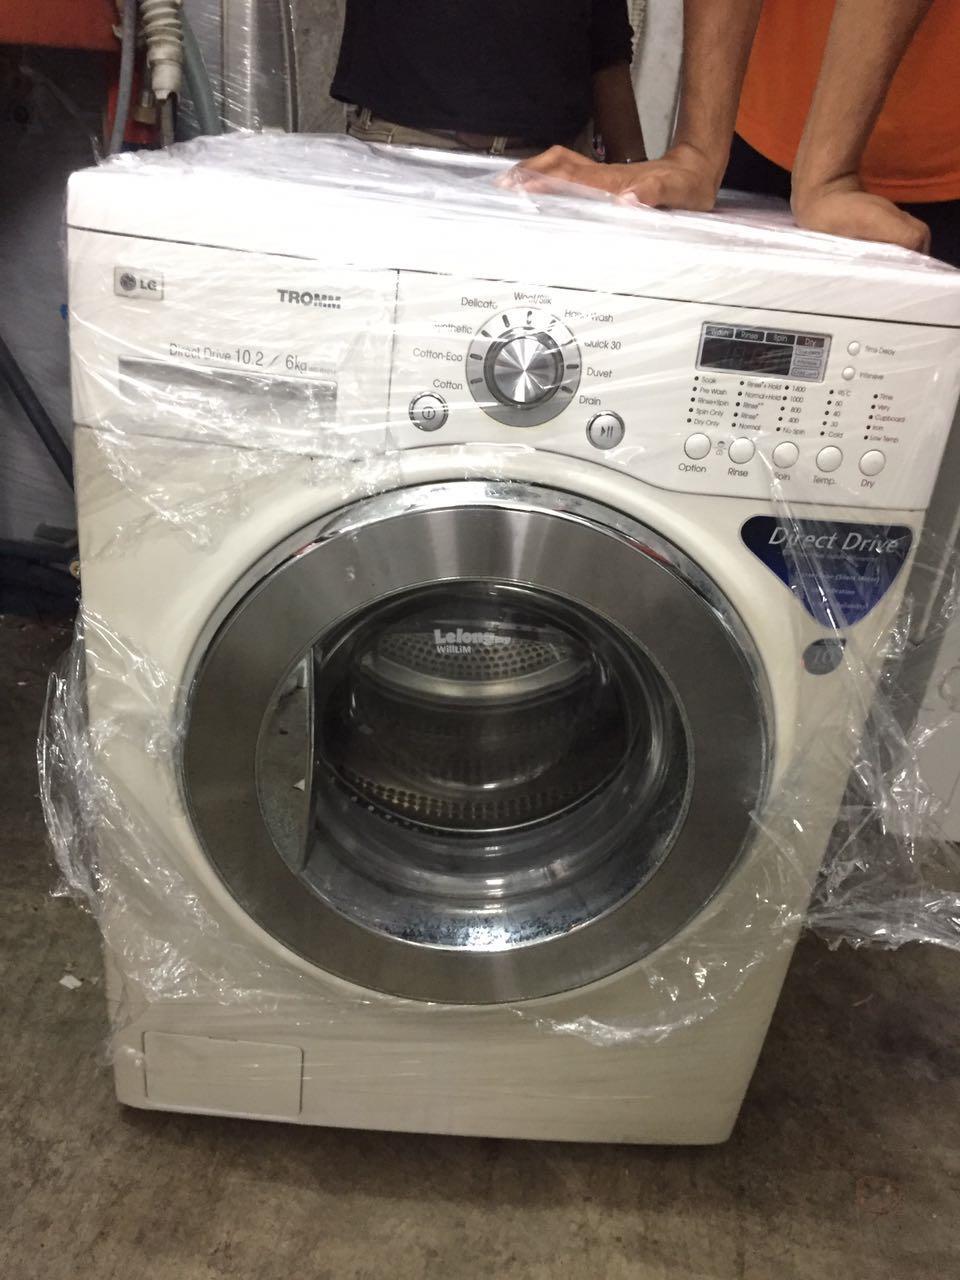 Refurbish Lg Washer Dryer Combo 10 2 End 5 2 2017 11 05 Am